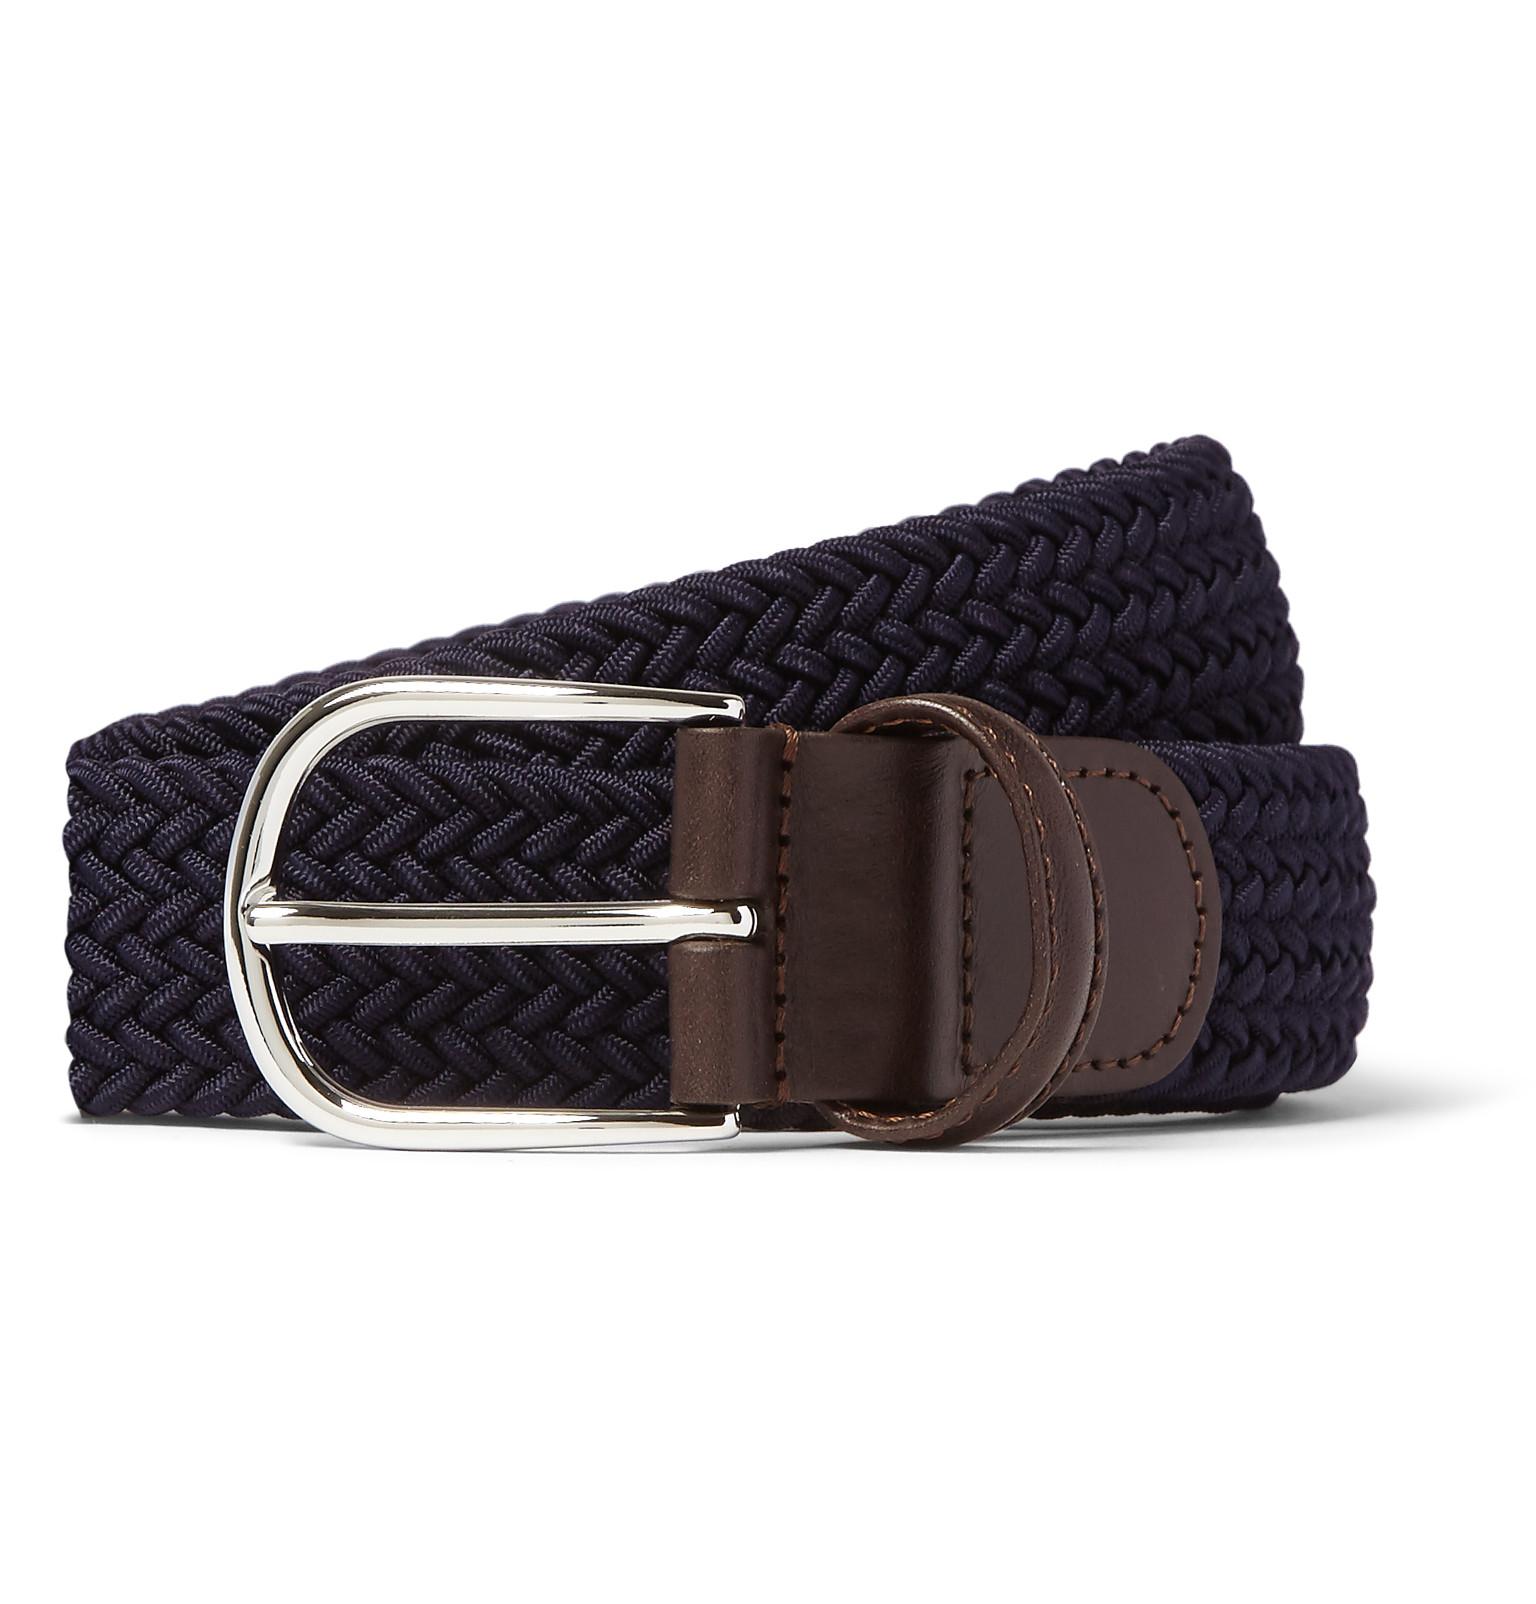 singapore fff reversible belt pad accessories bgcolor tom ford sg buckle reebonz mode mens t